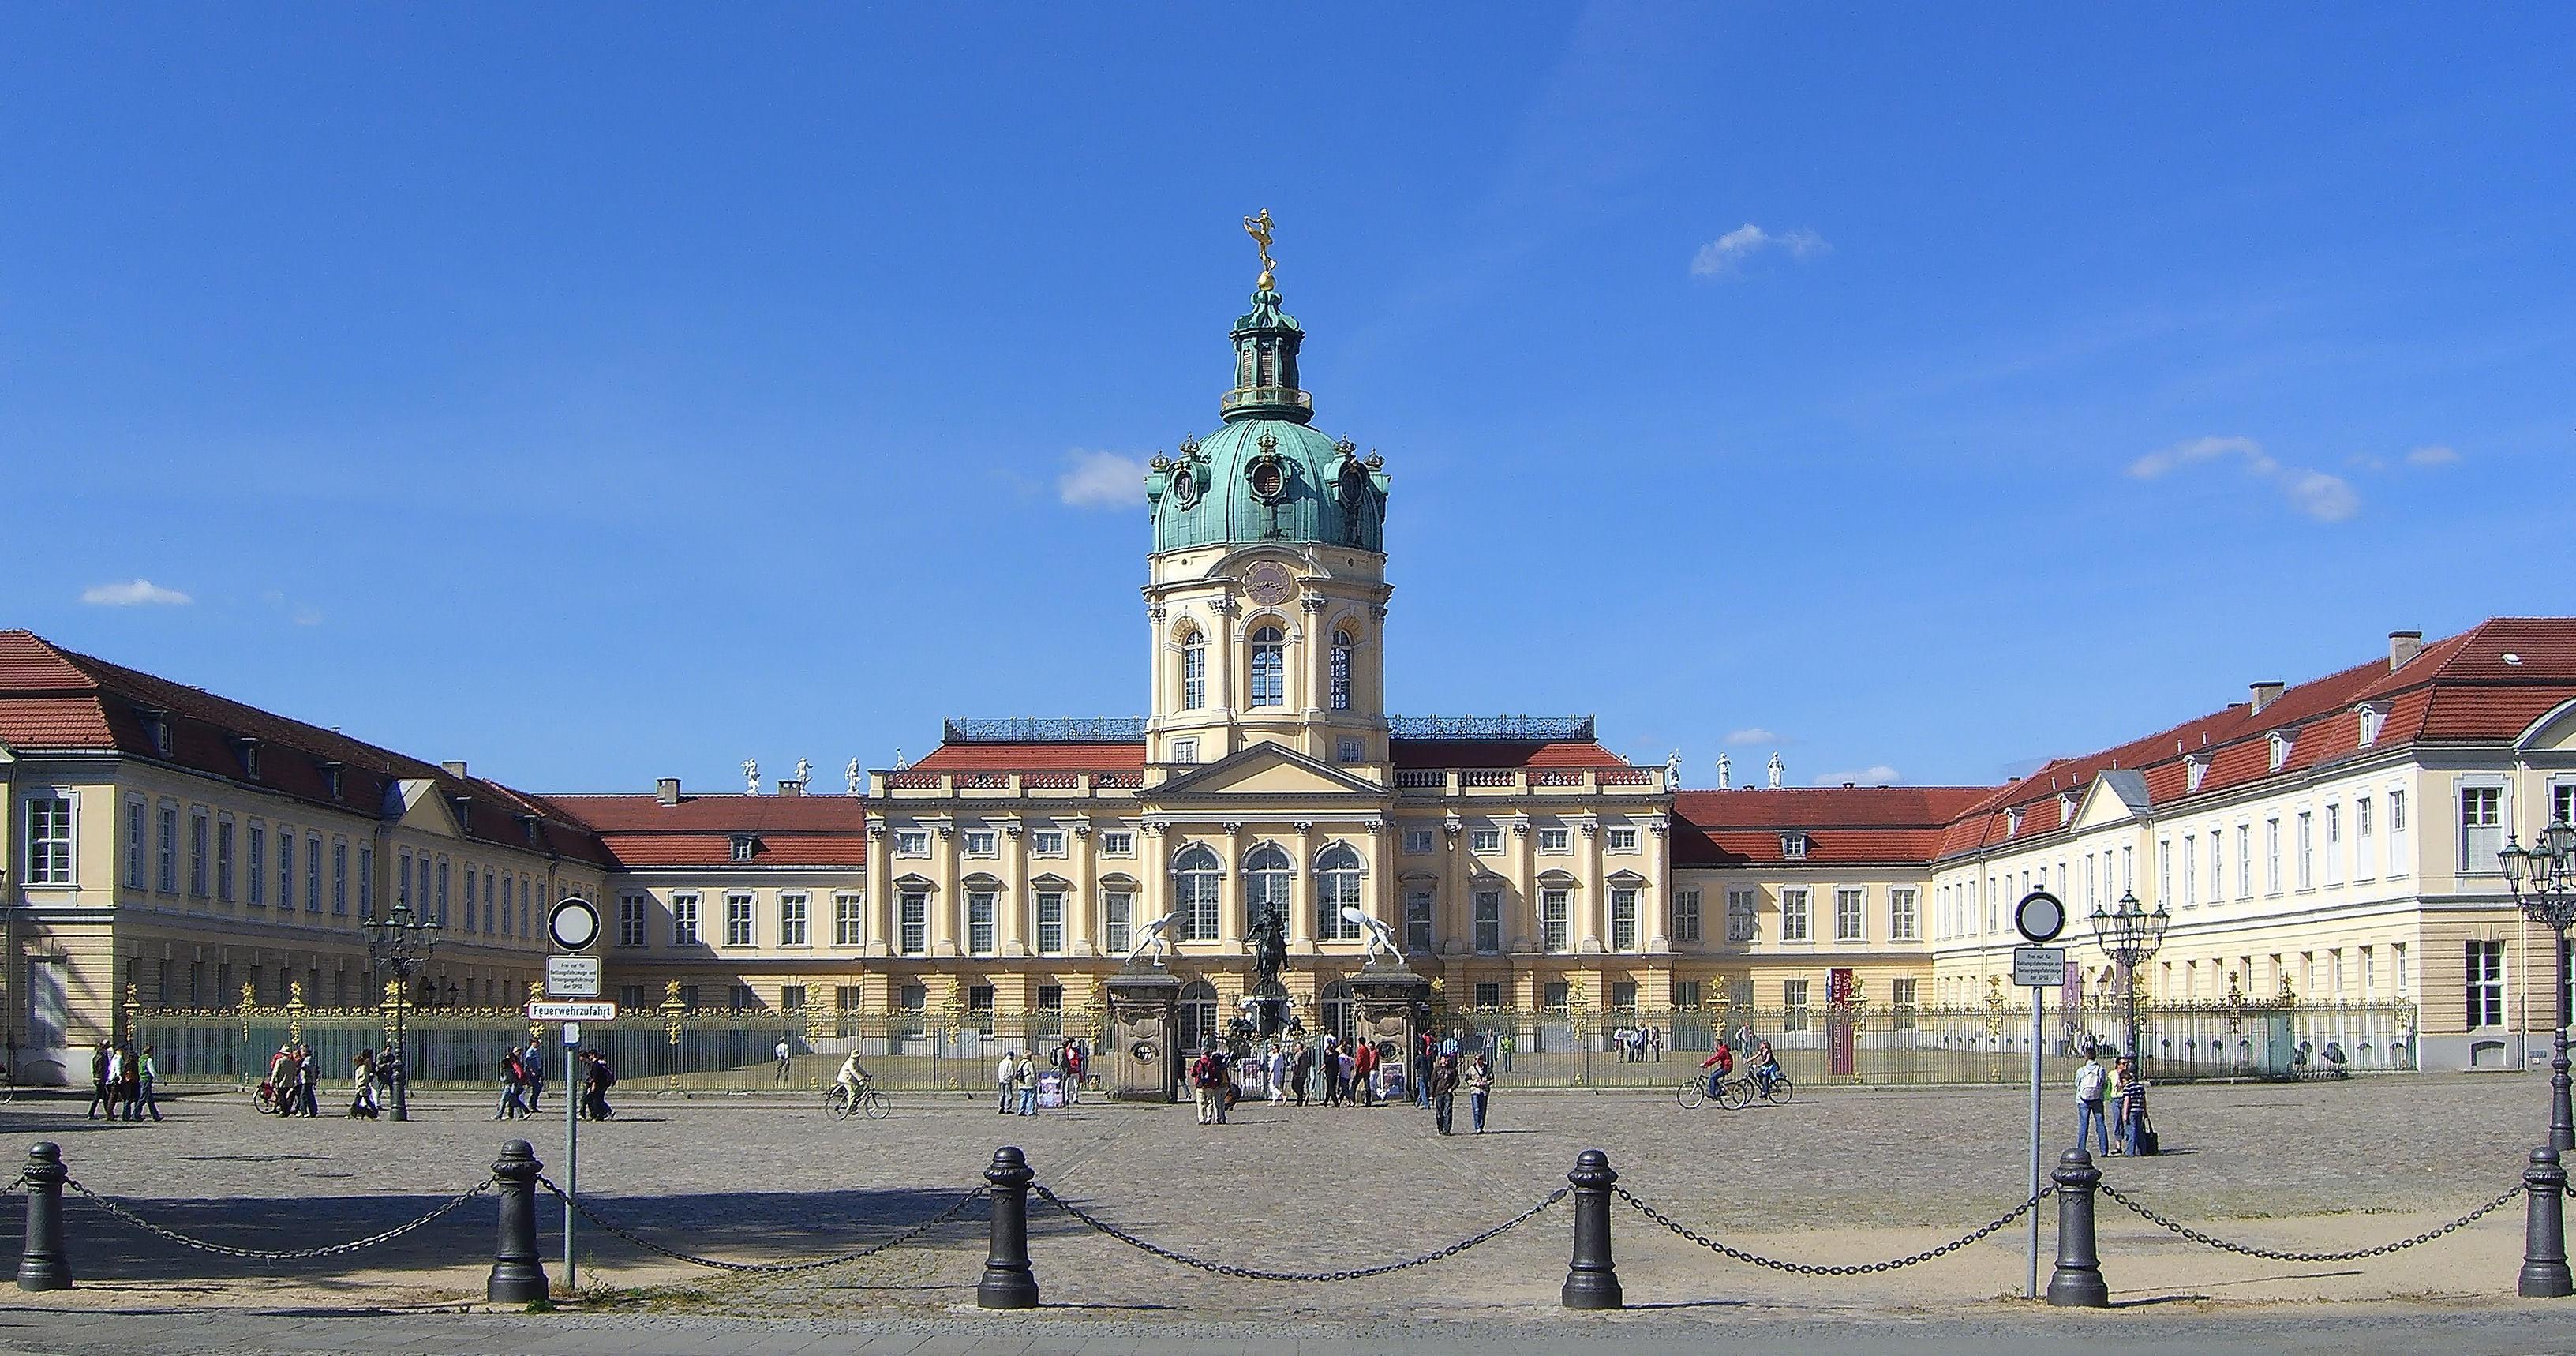 Berlin Charlottenburger Schloss Strassenseite.jpg